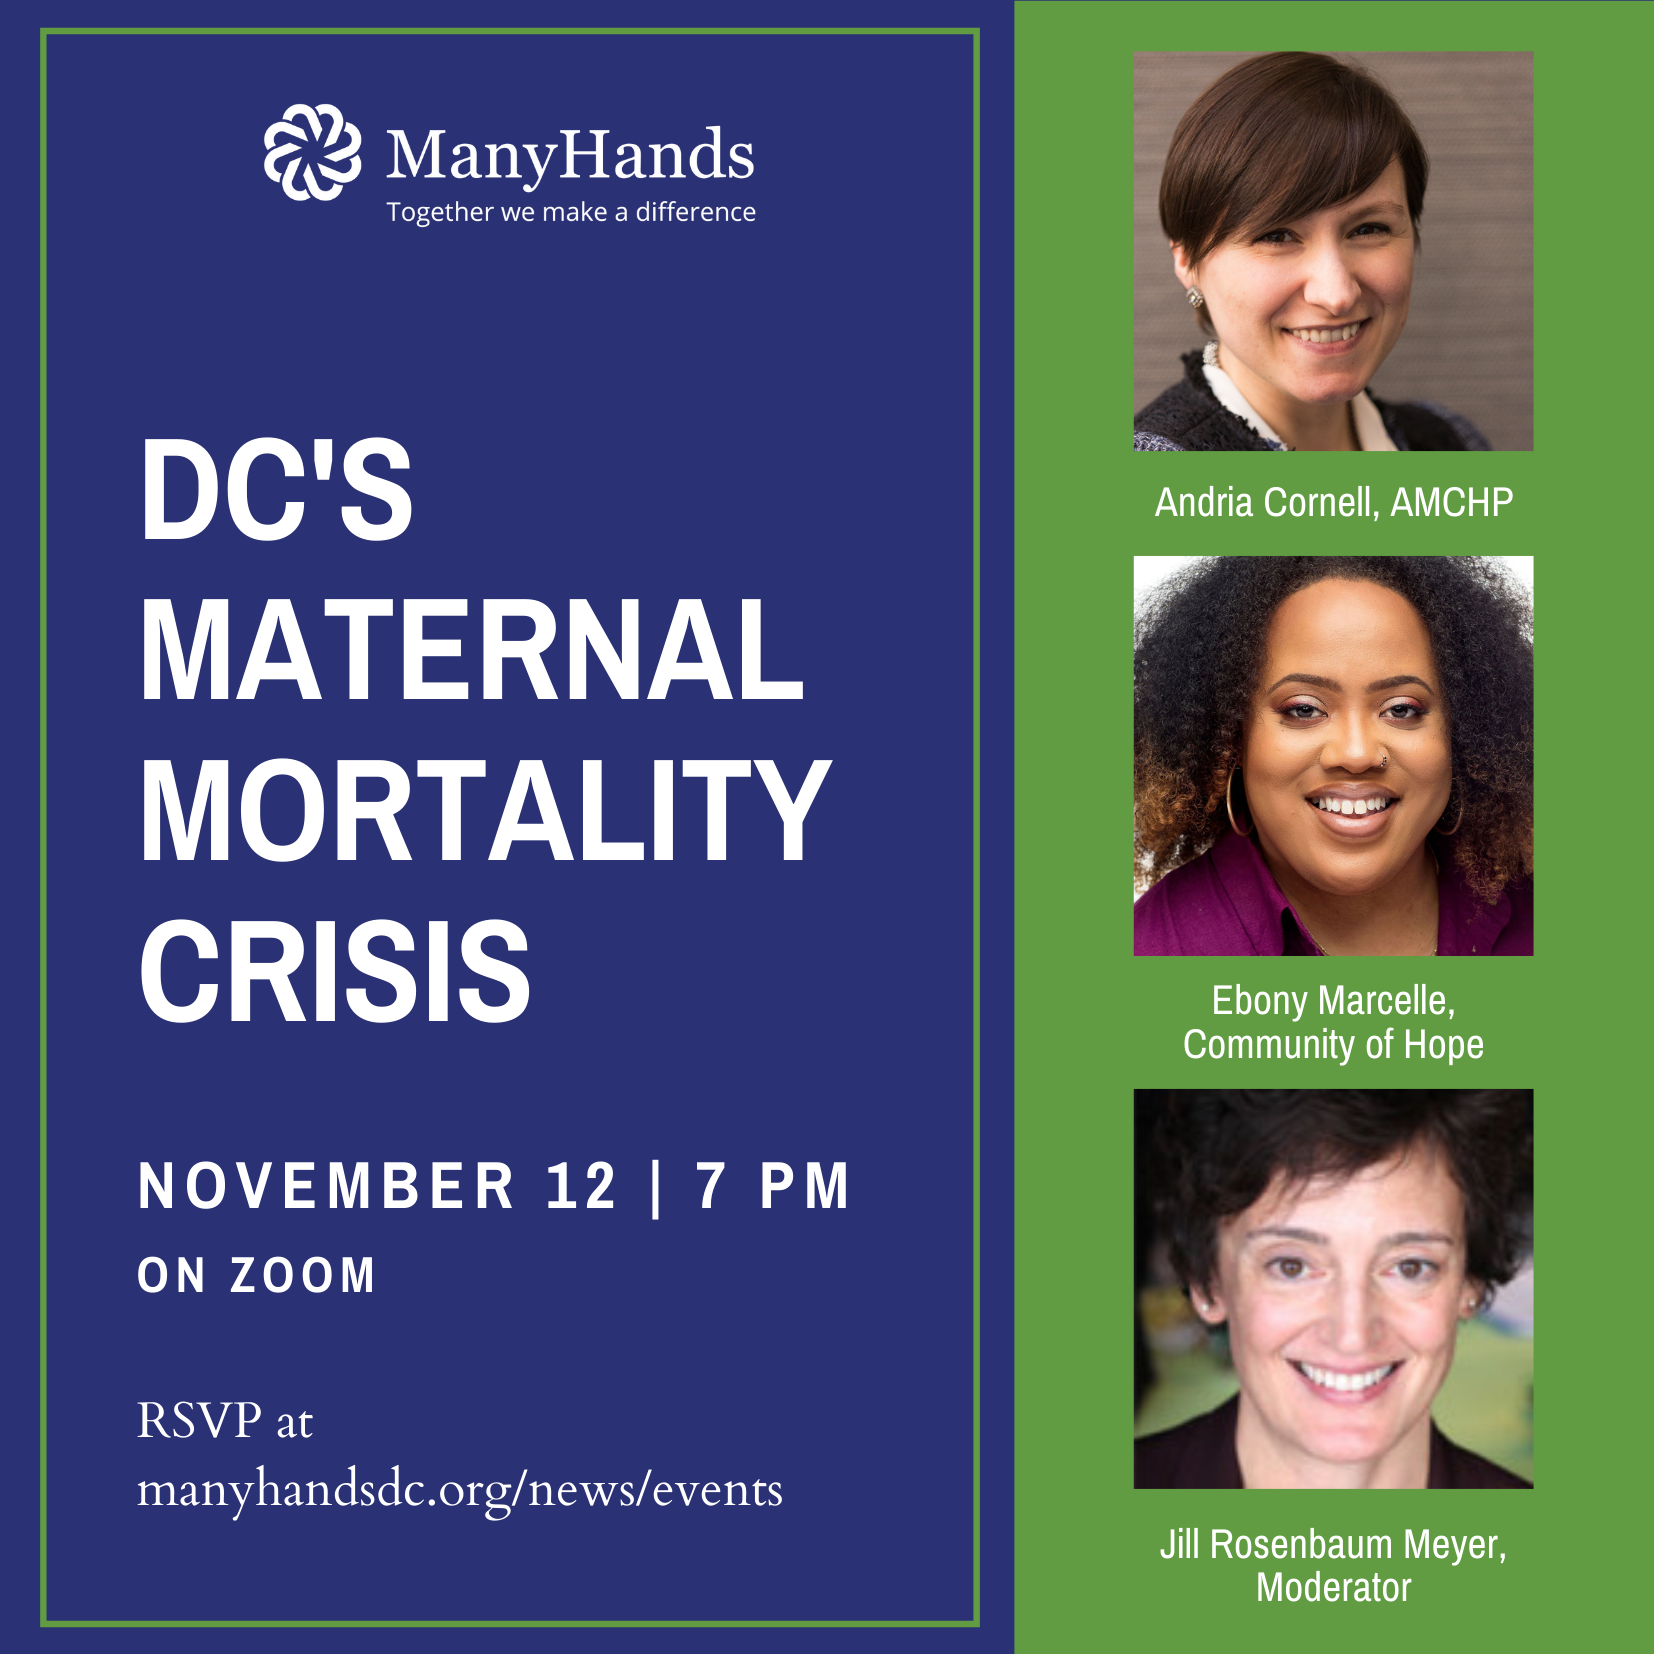 Invitation to Nov 12 maternal mortality panel